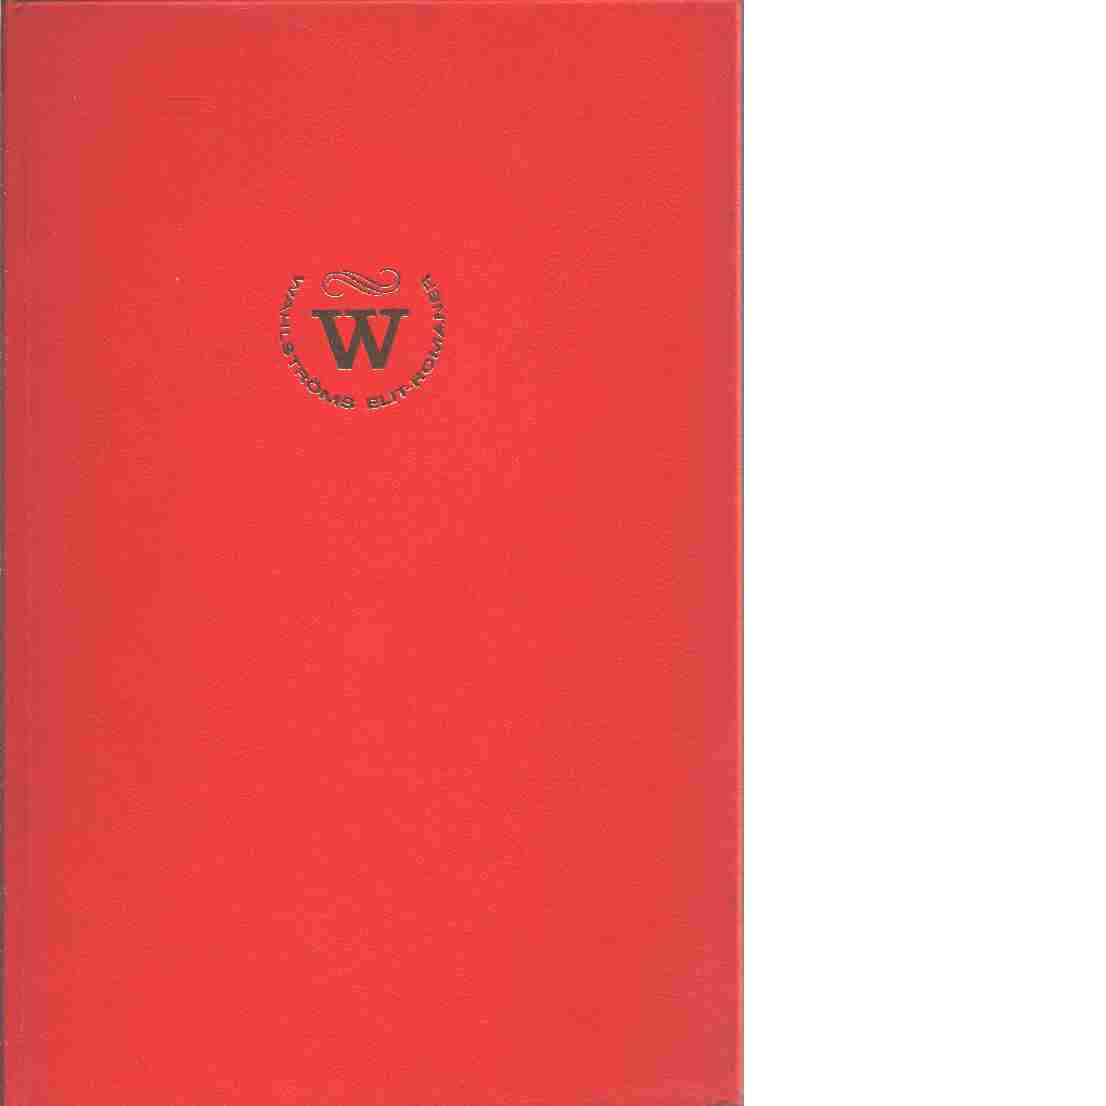 Piccadilly-Jim - Wodehouse, P. G.